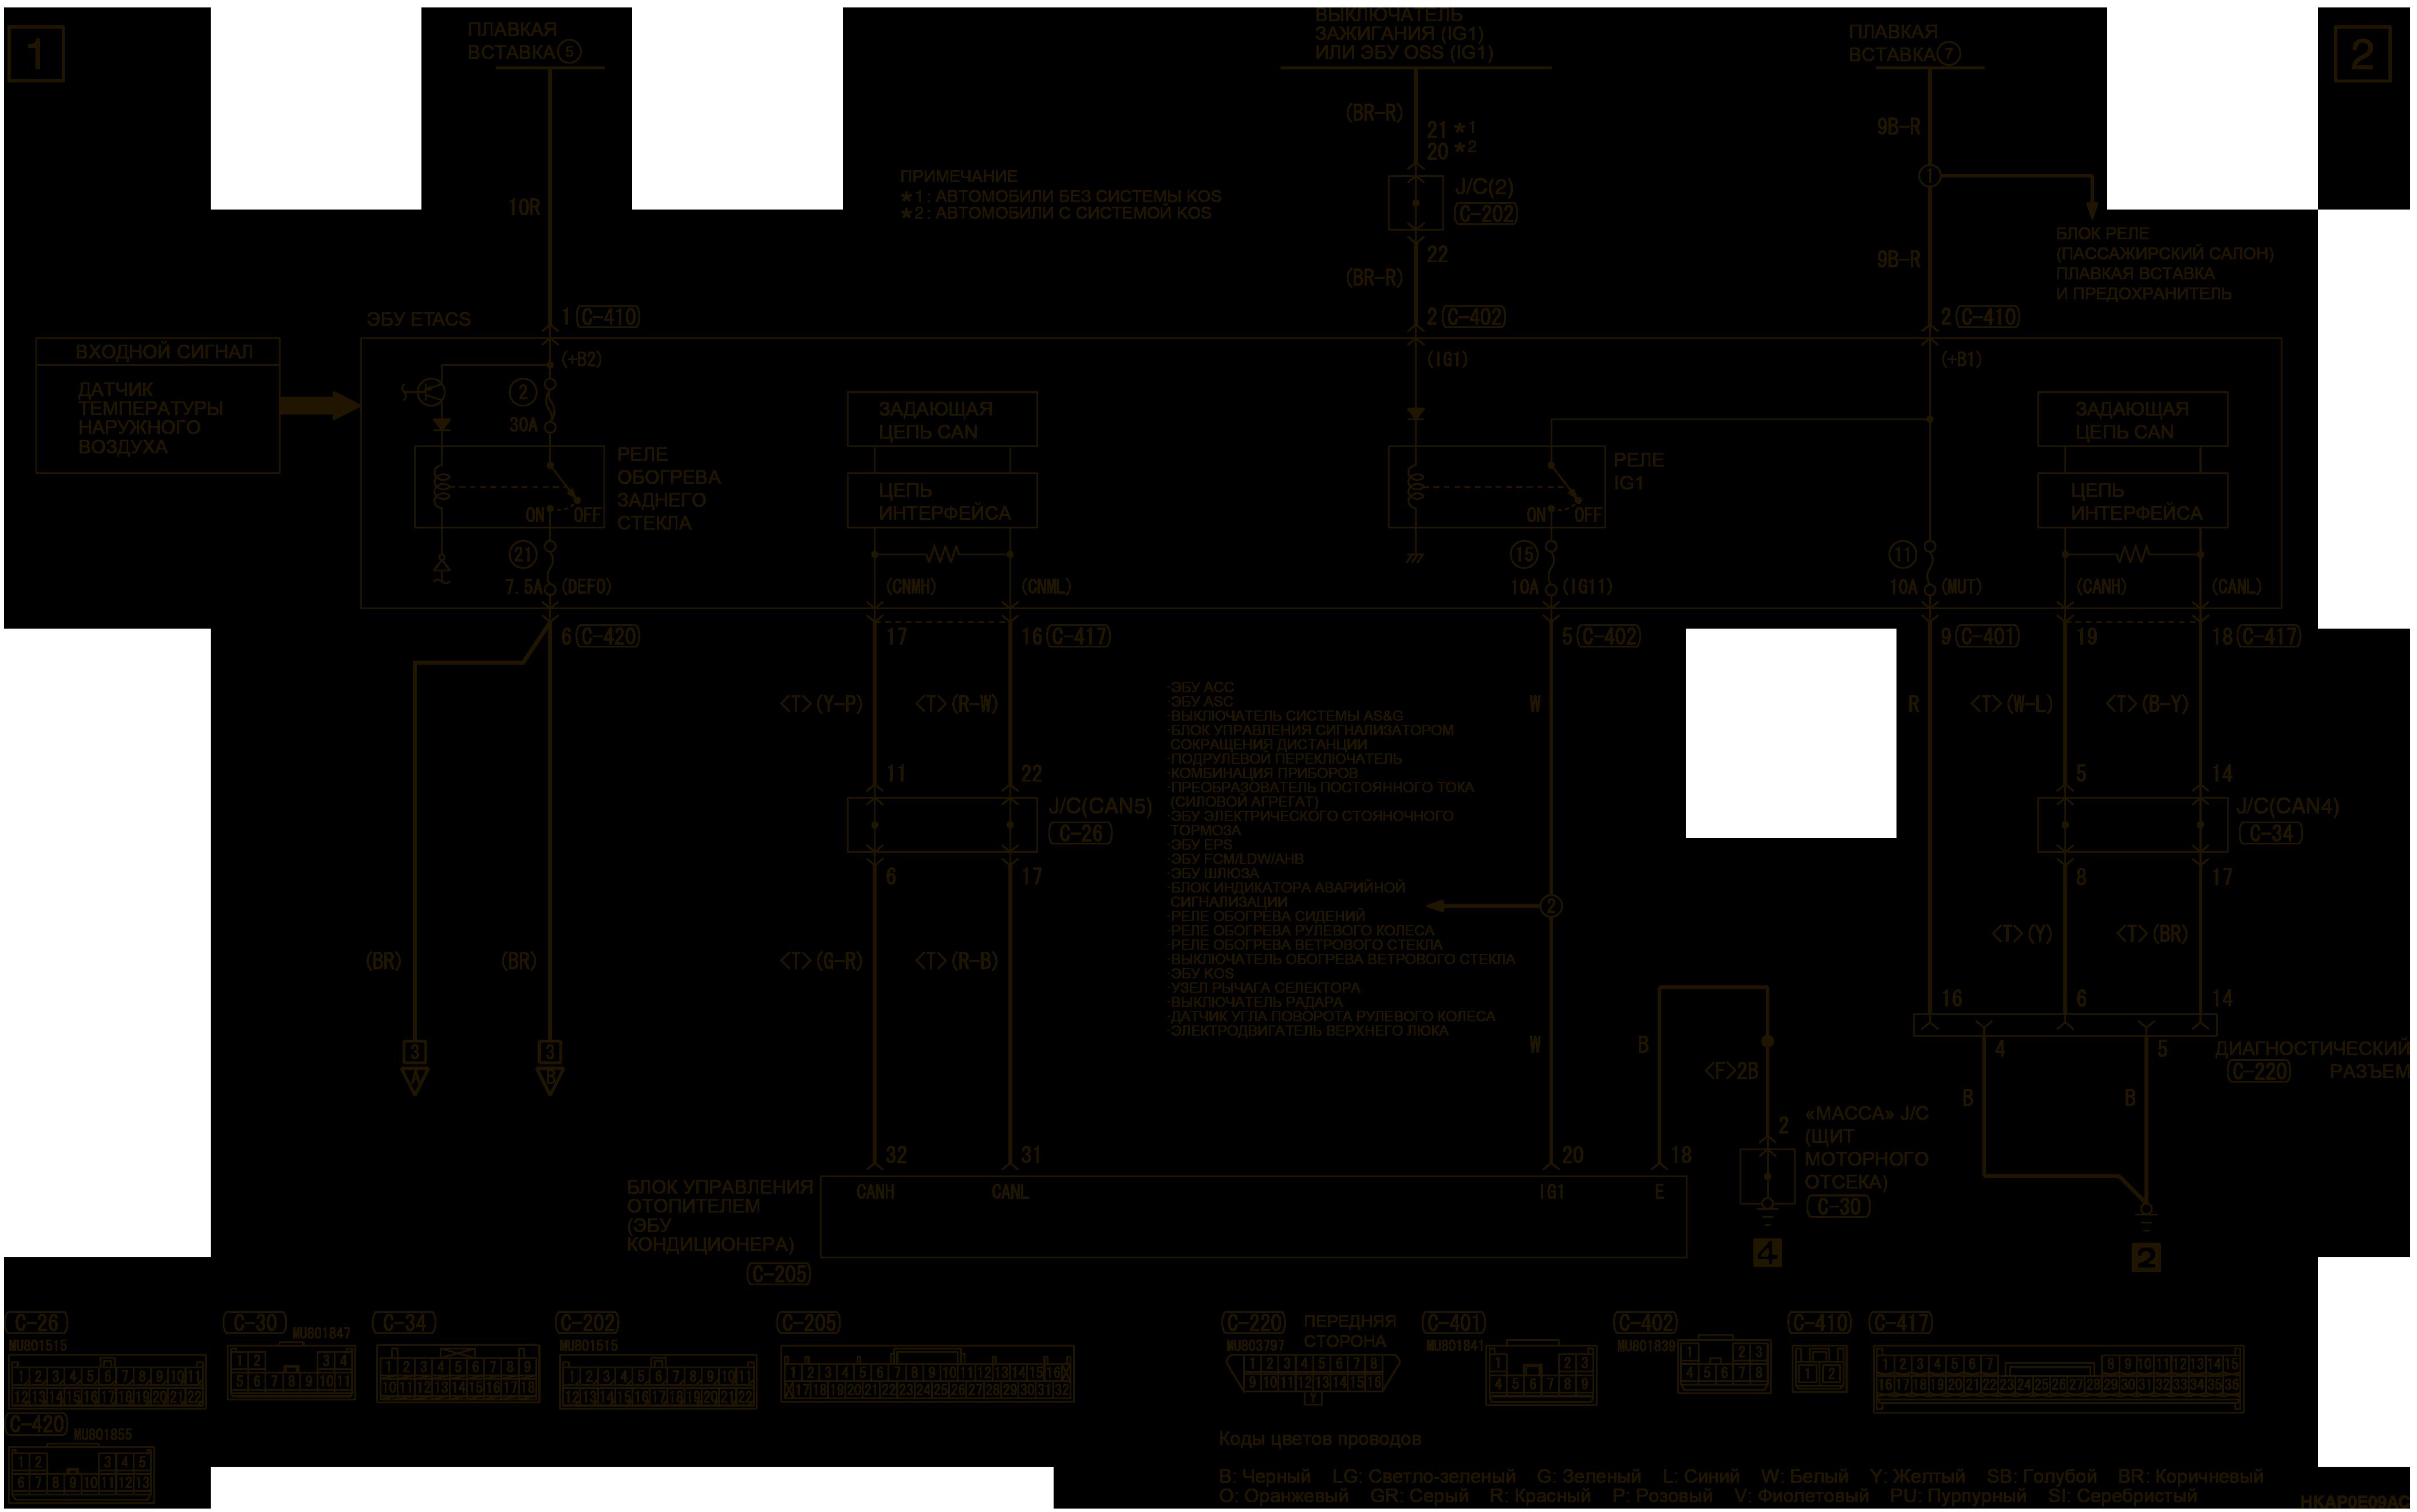 mmc аутлендер 3 2019 электросхемаЭЛЕКТРООБОГРЕВ НАРУЖНЫХ ЗЕРКАЛ ПРАВАЯ СТОРОНА